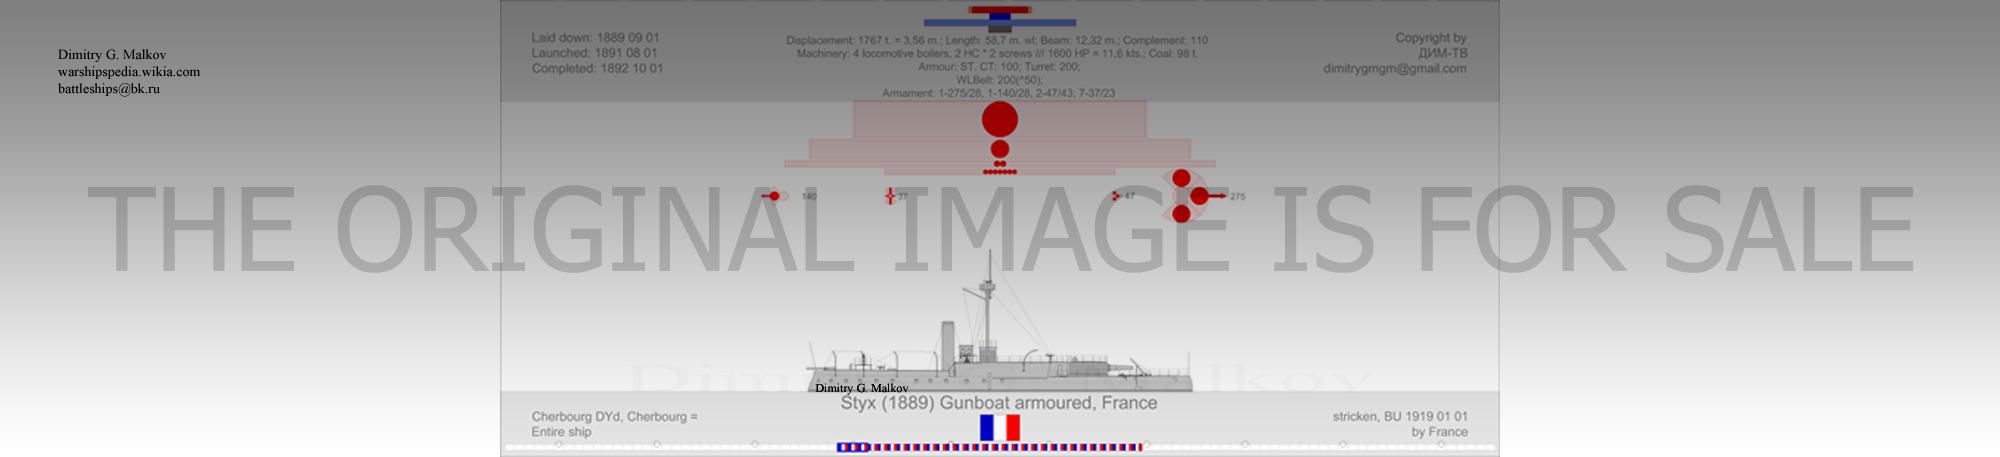 Mes dessins des navires francais - Page 9 Ga-18810